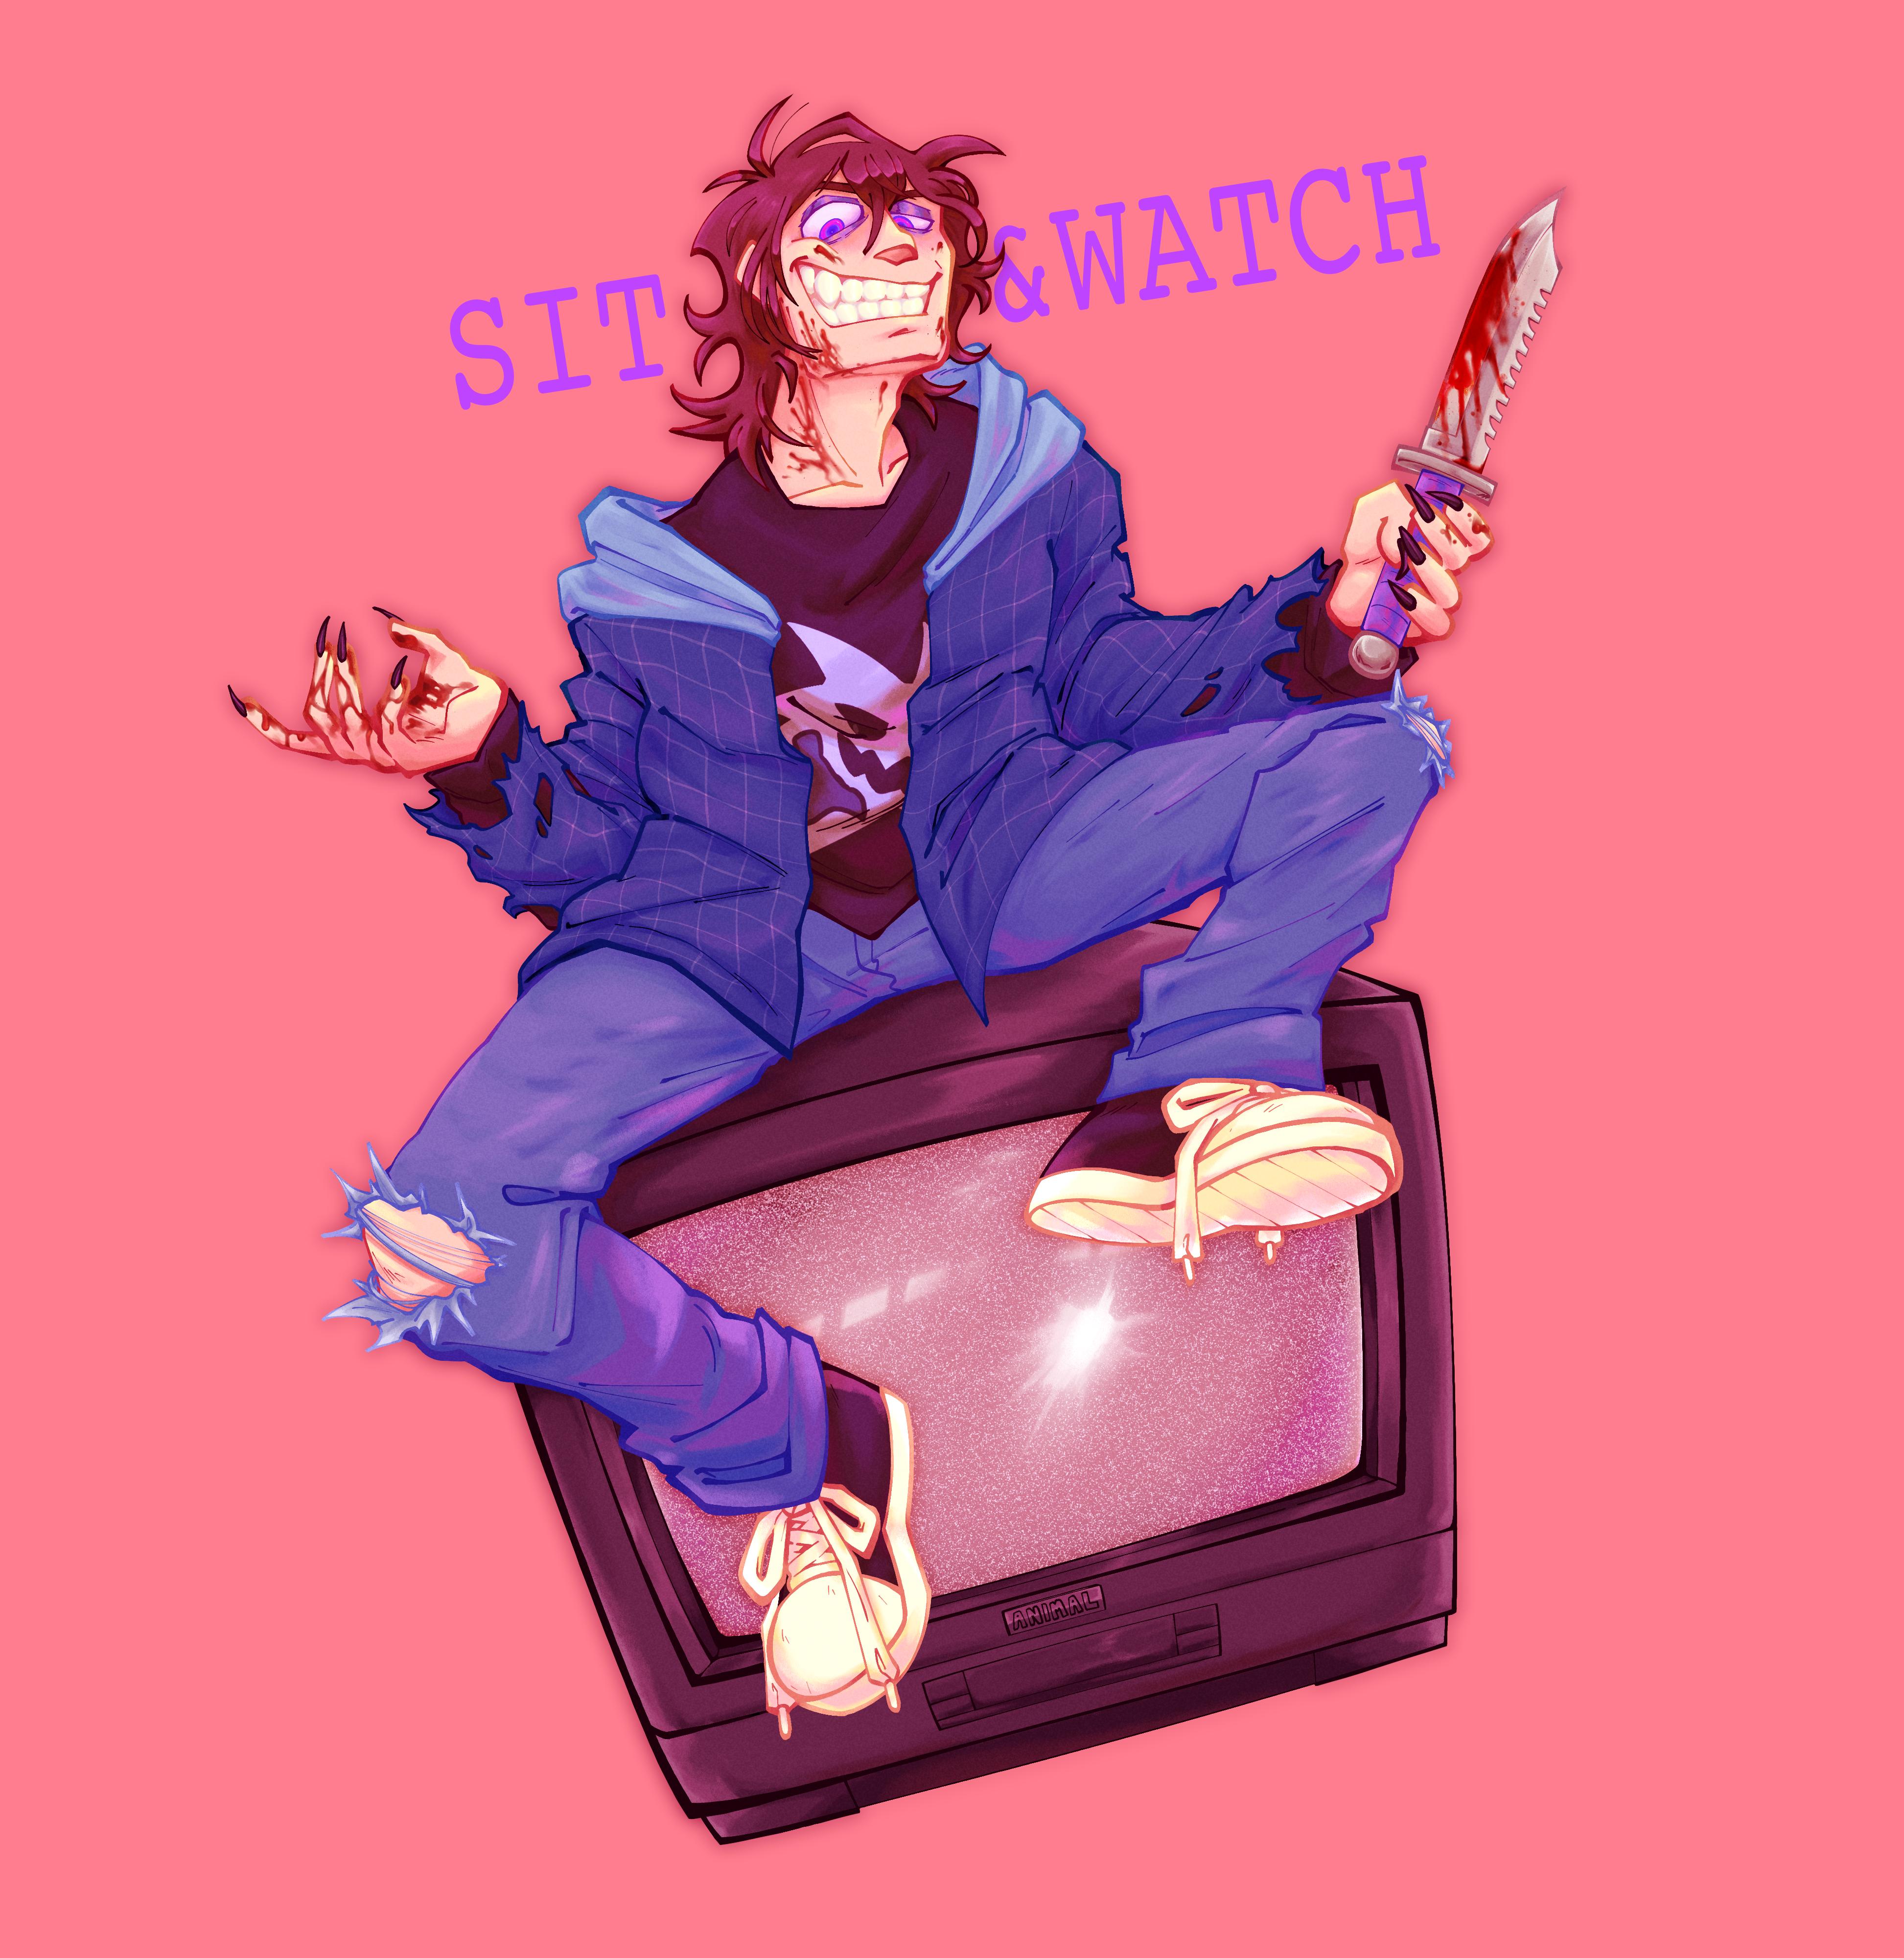 SIT & WATCH